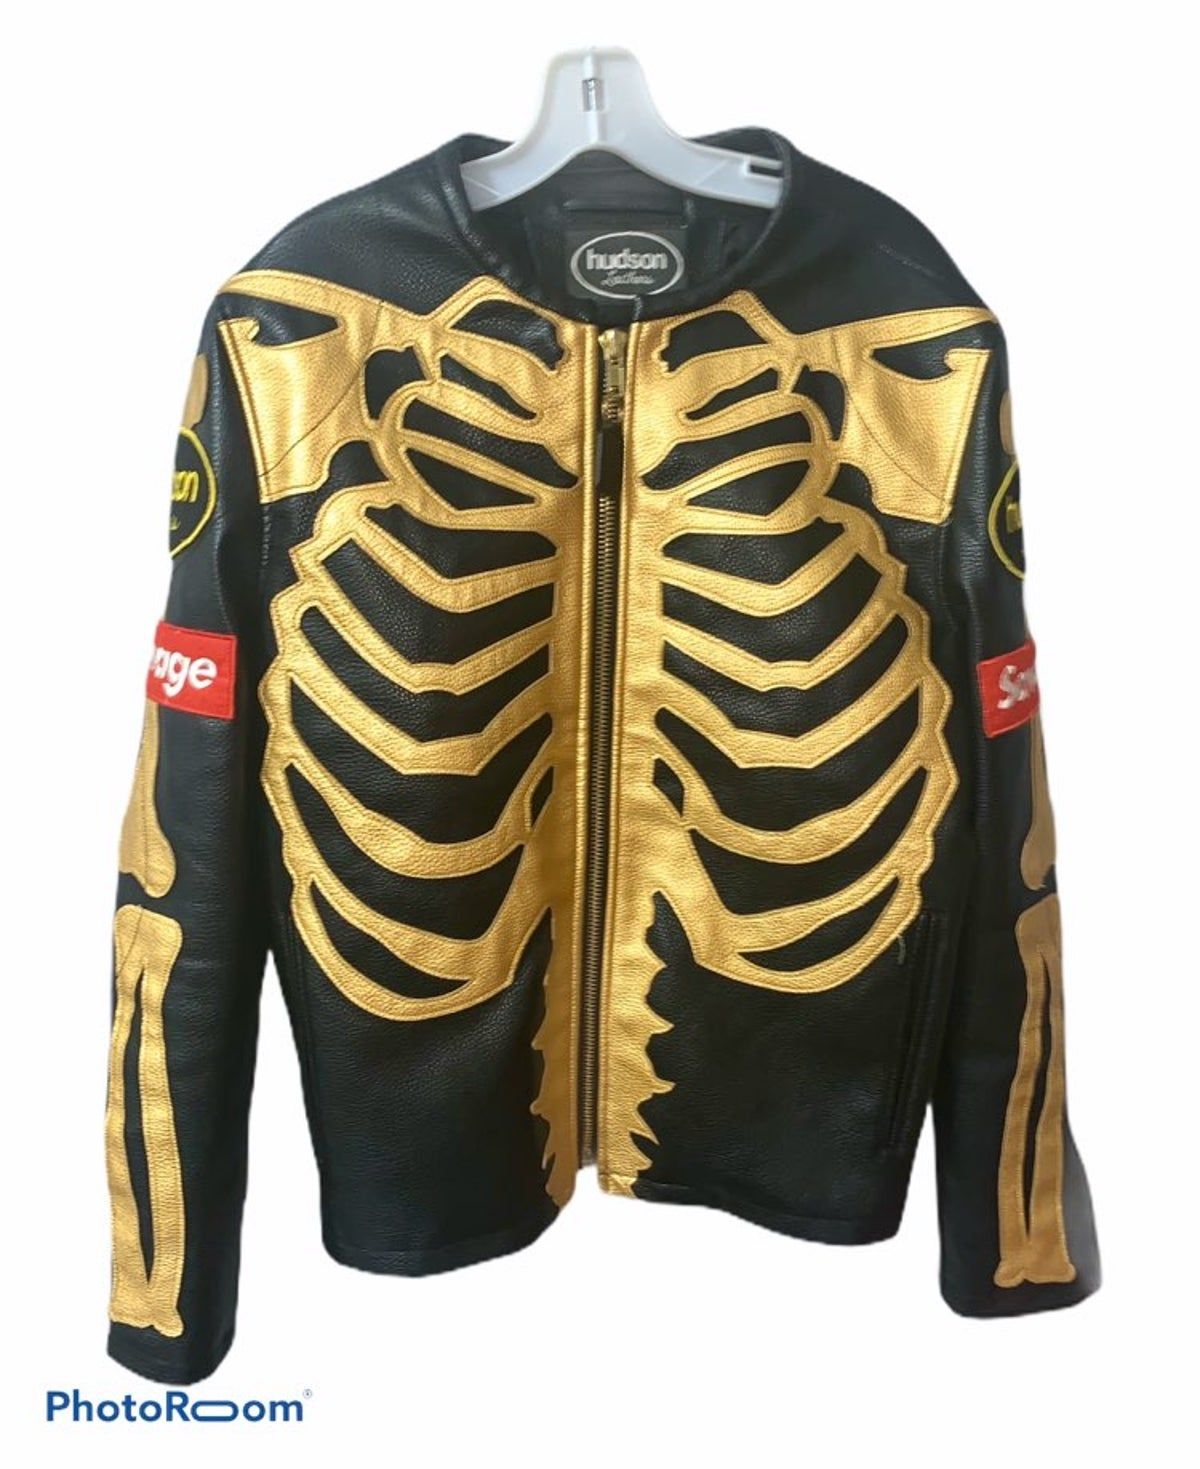 Hudson Faux Leather Skeleton Motorcycle Black And Gold Jacket Gold Jacket Faux Leather [ 1469 x 1200 Pixel ]